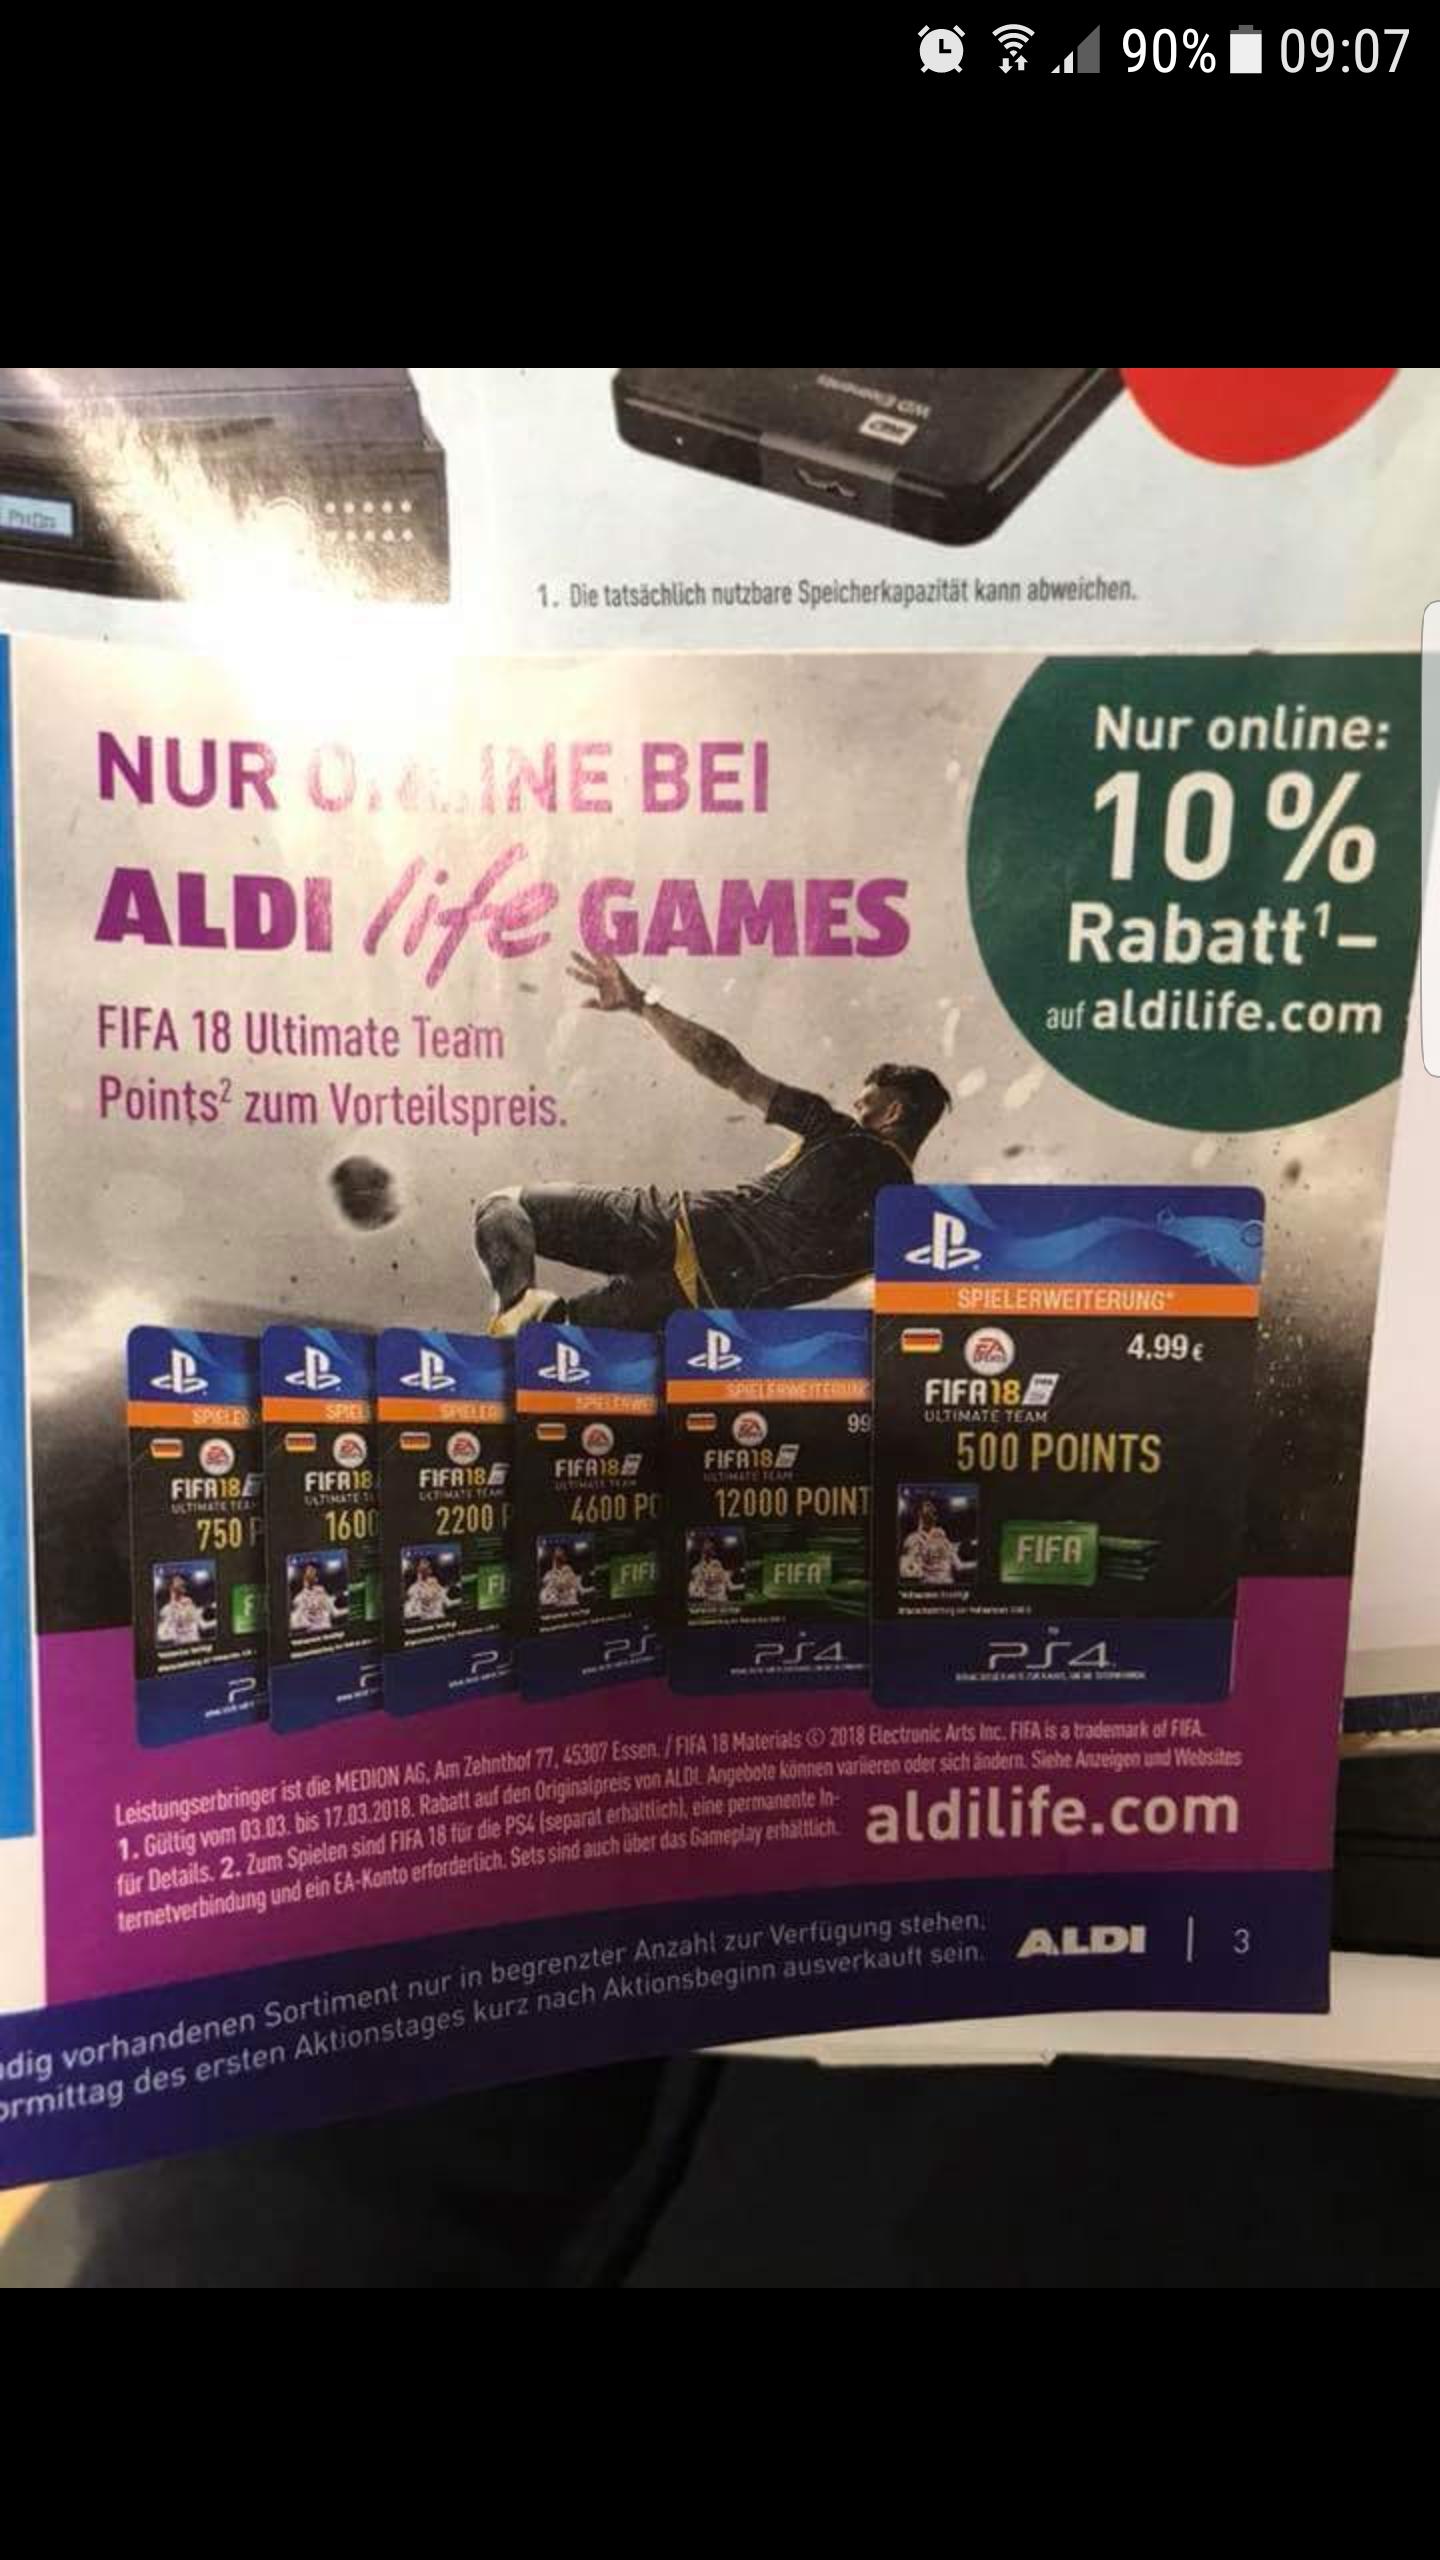 [AldiLife] 10% Rabatt auf Fifa 18 Ultimate Team Points